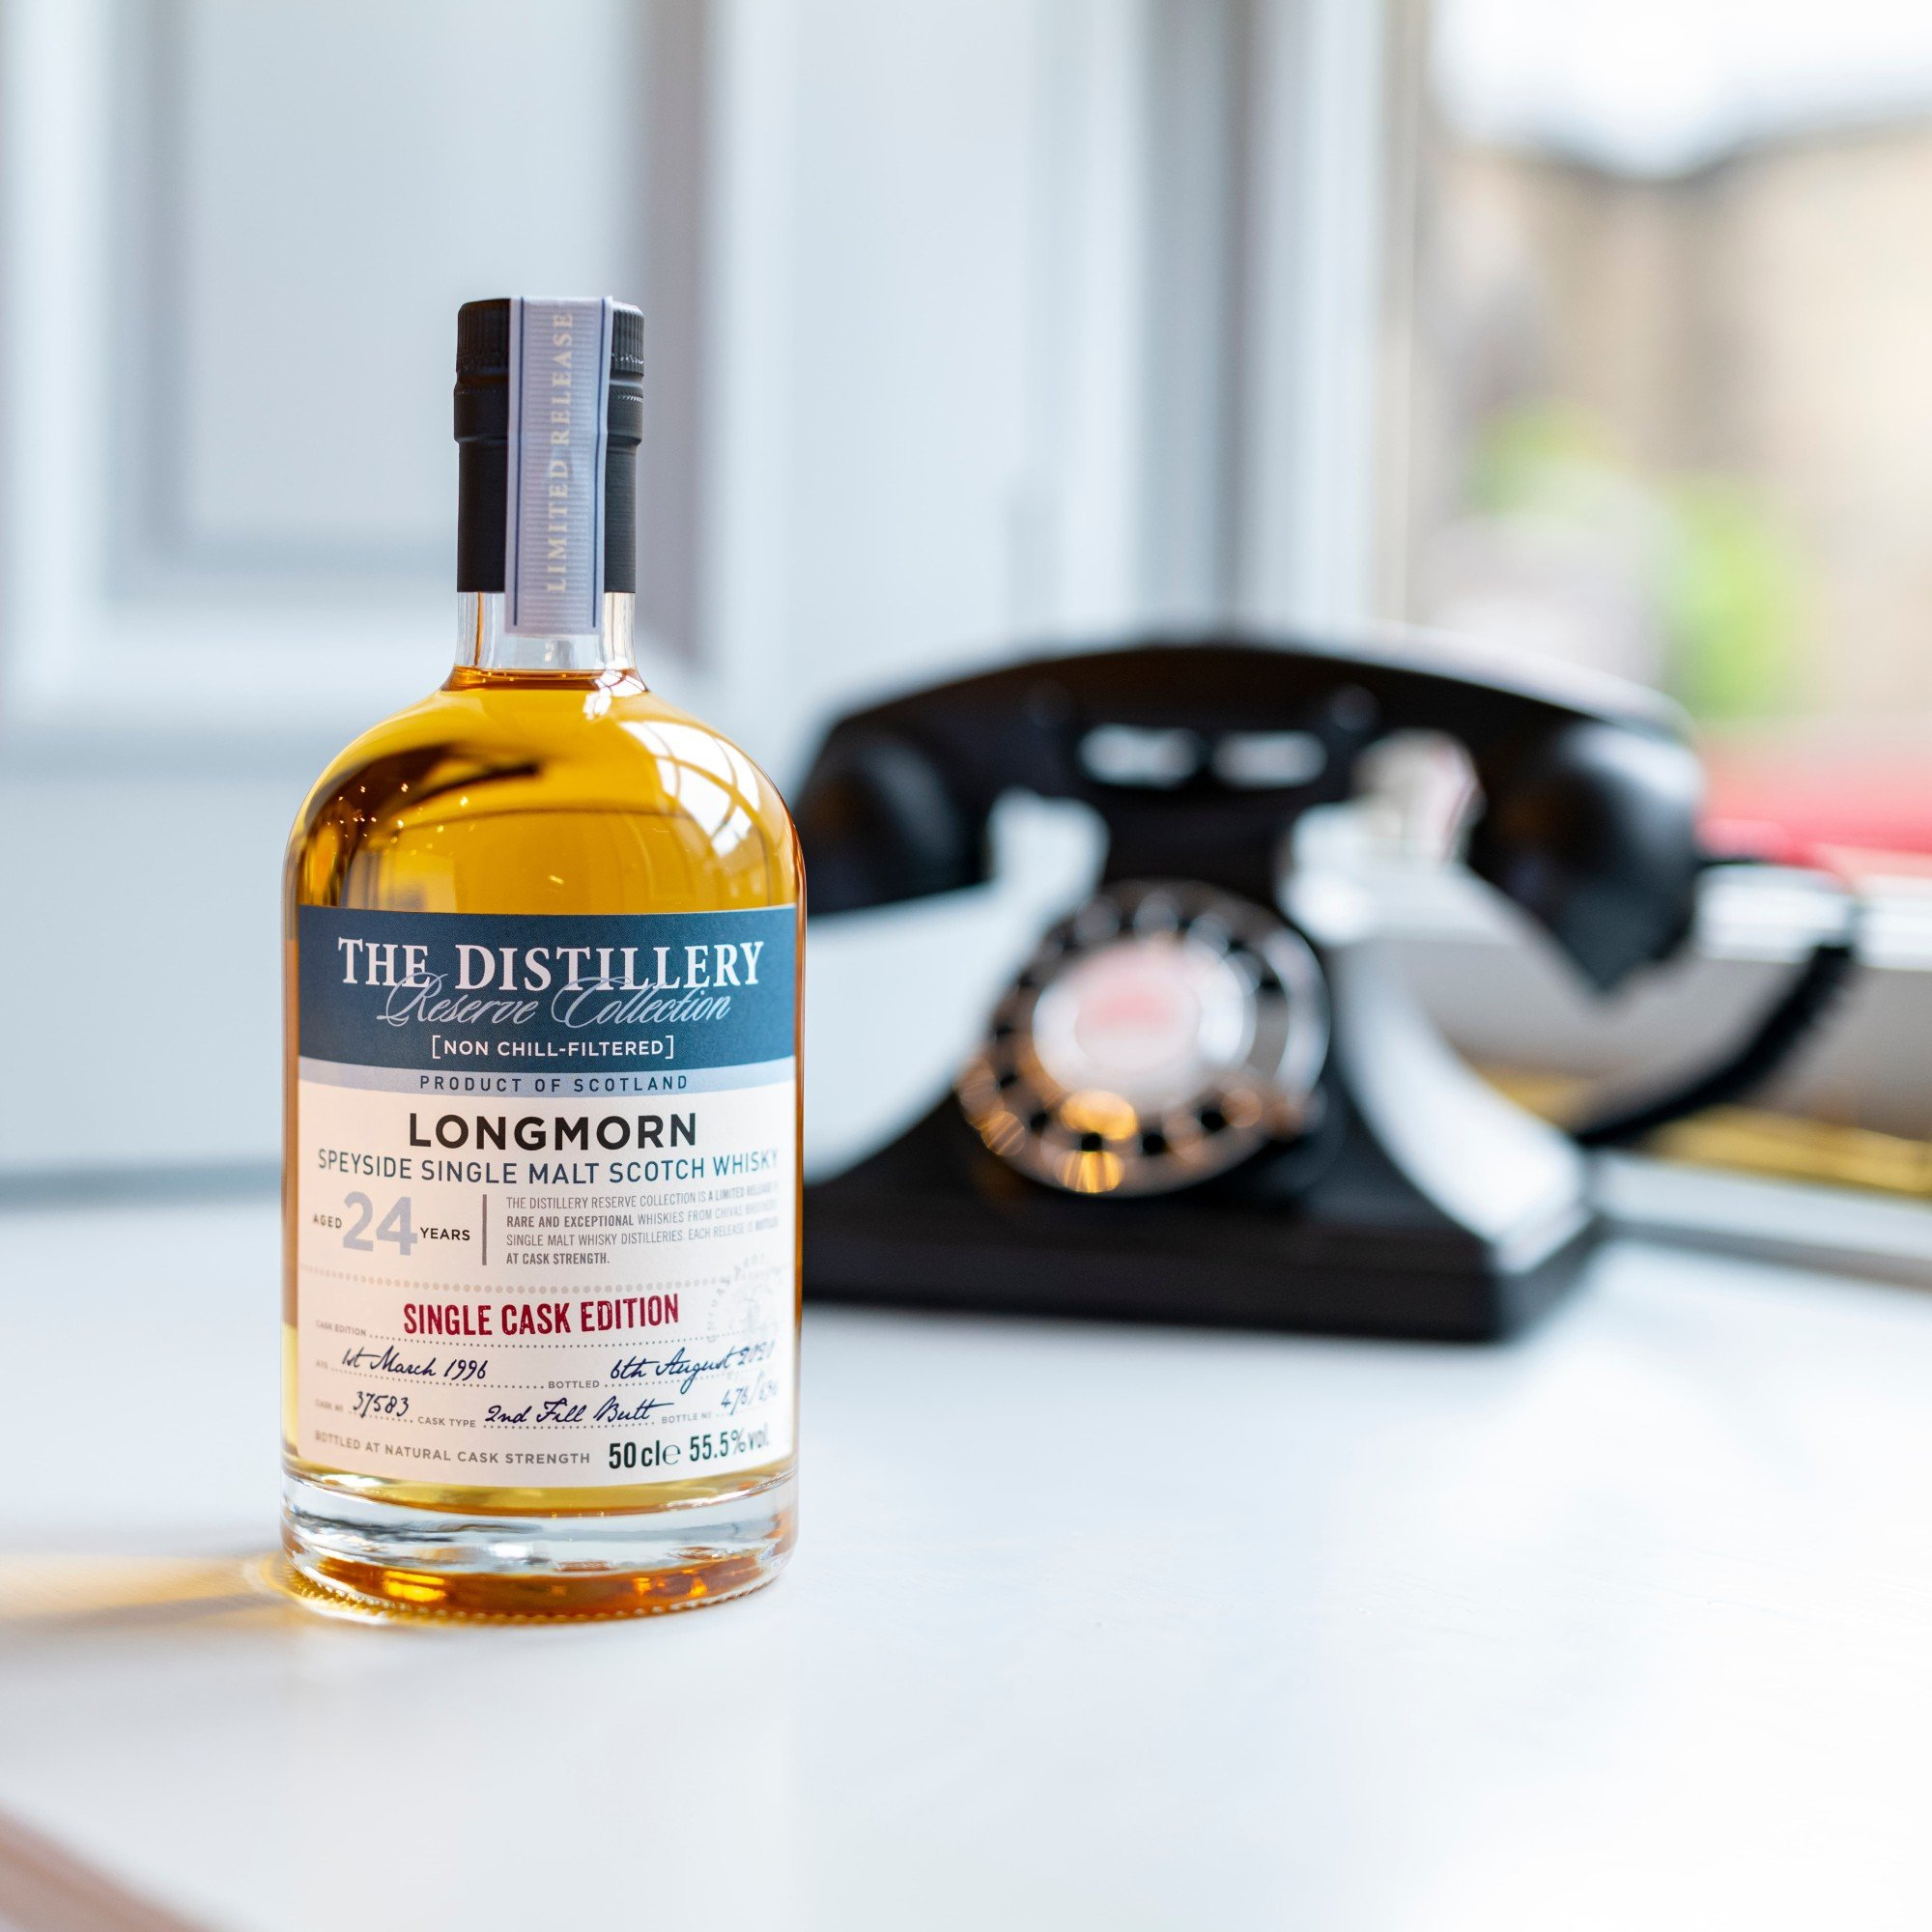 Longmorn 24 Year Old Single Scotch Whisky